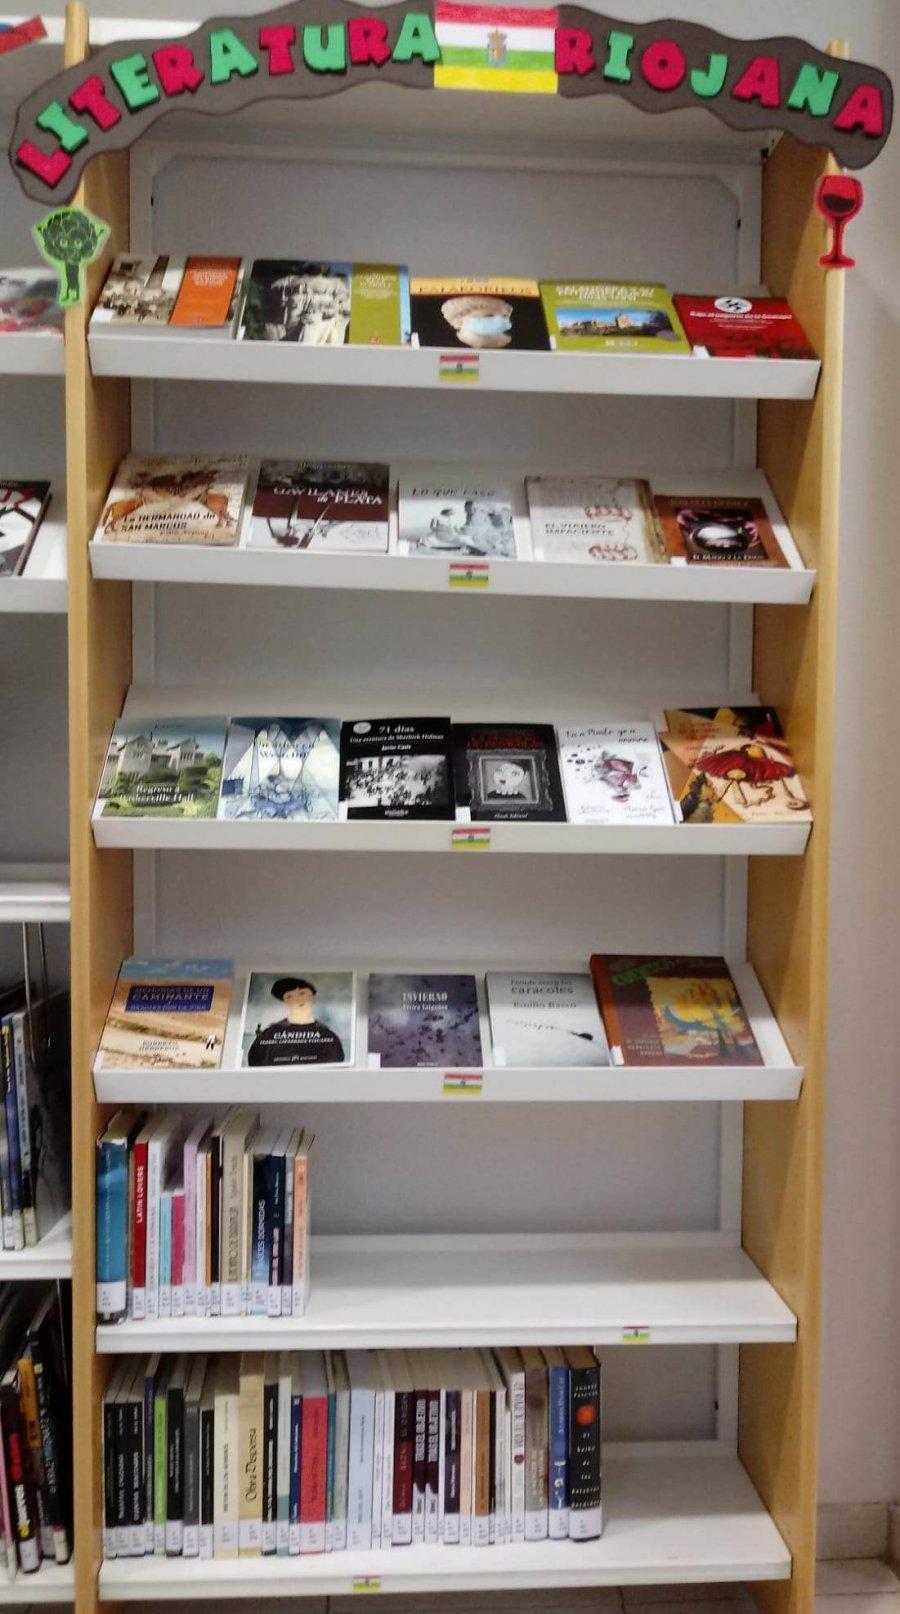 CALAHORRA biblioteca seccion literatura riojana